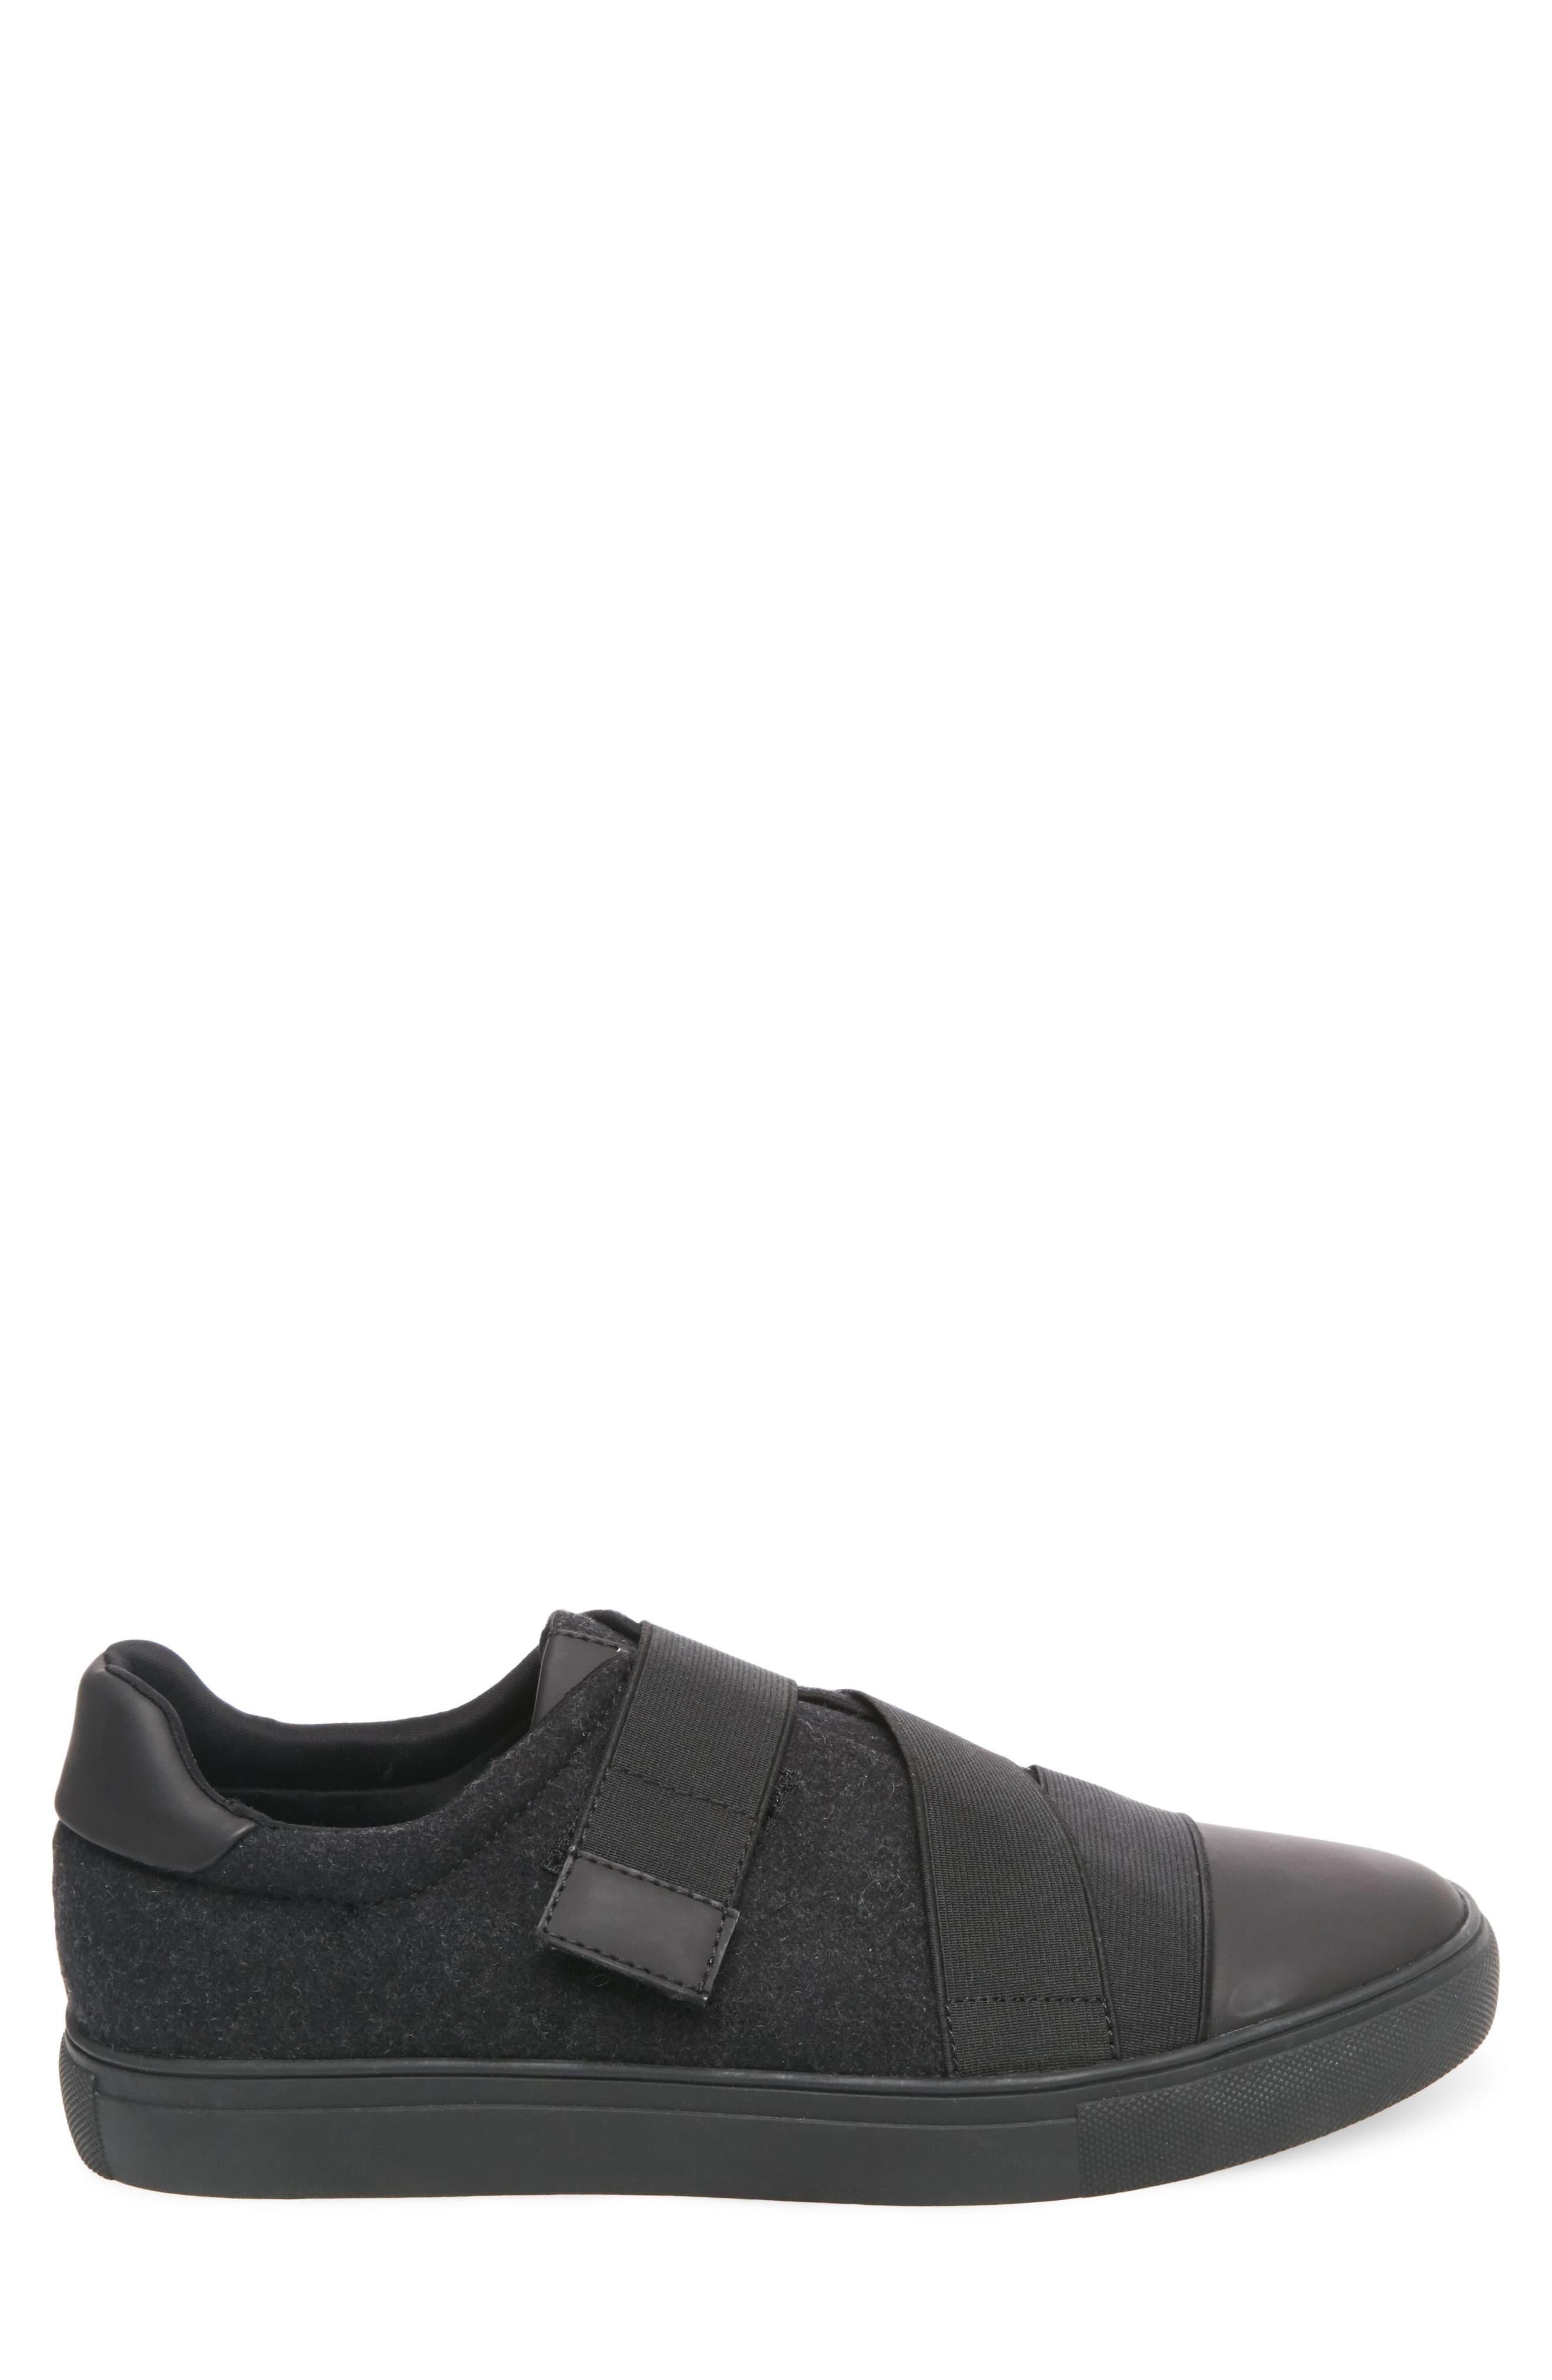 Westy Sneaker,                             Alternate thumbnail 3, color,                             Black